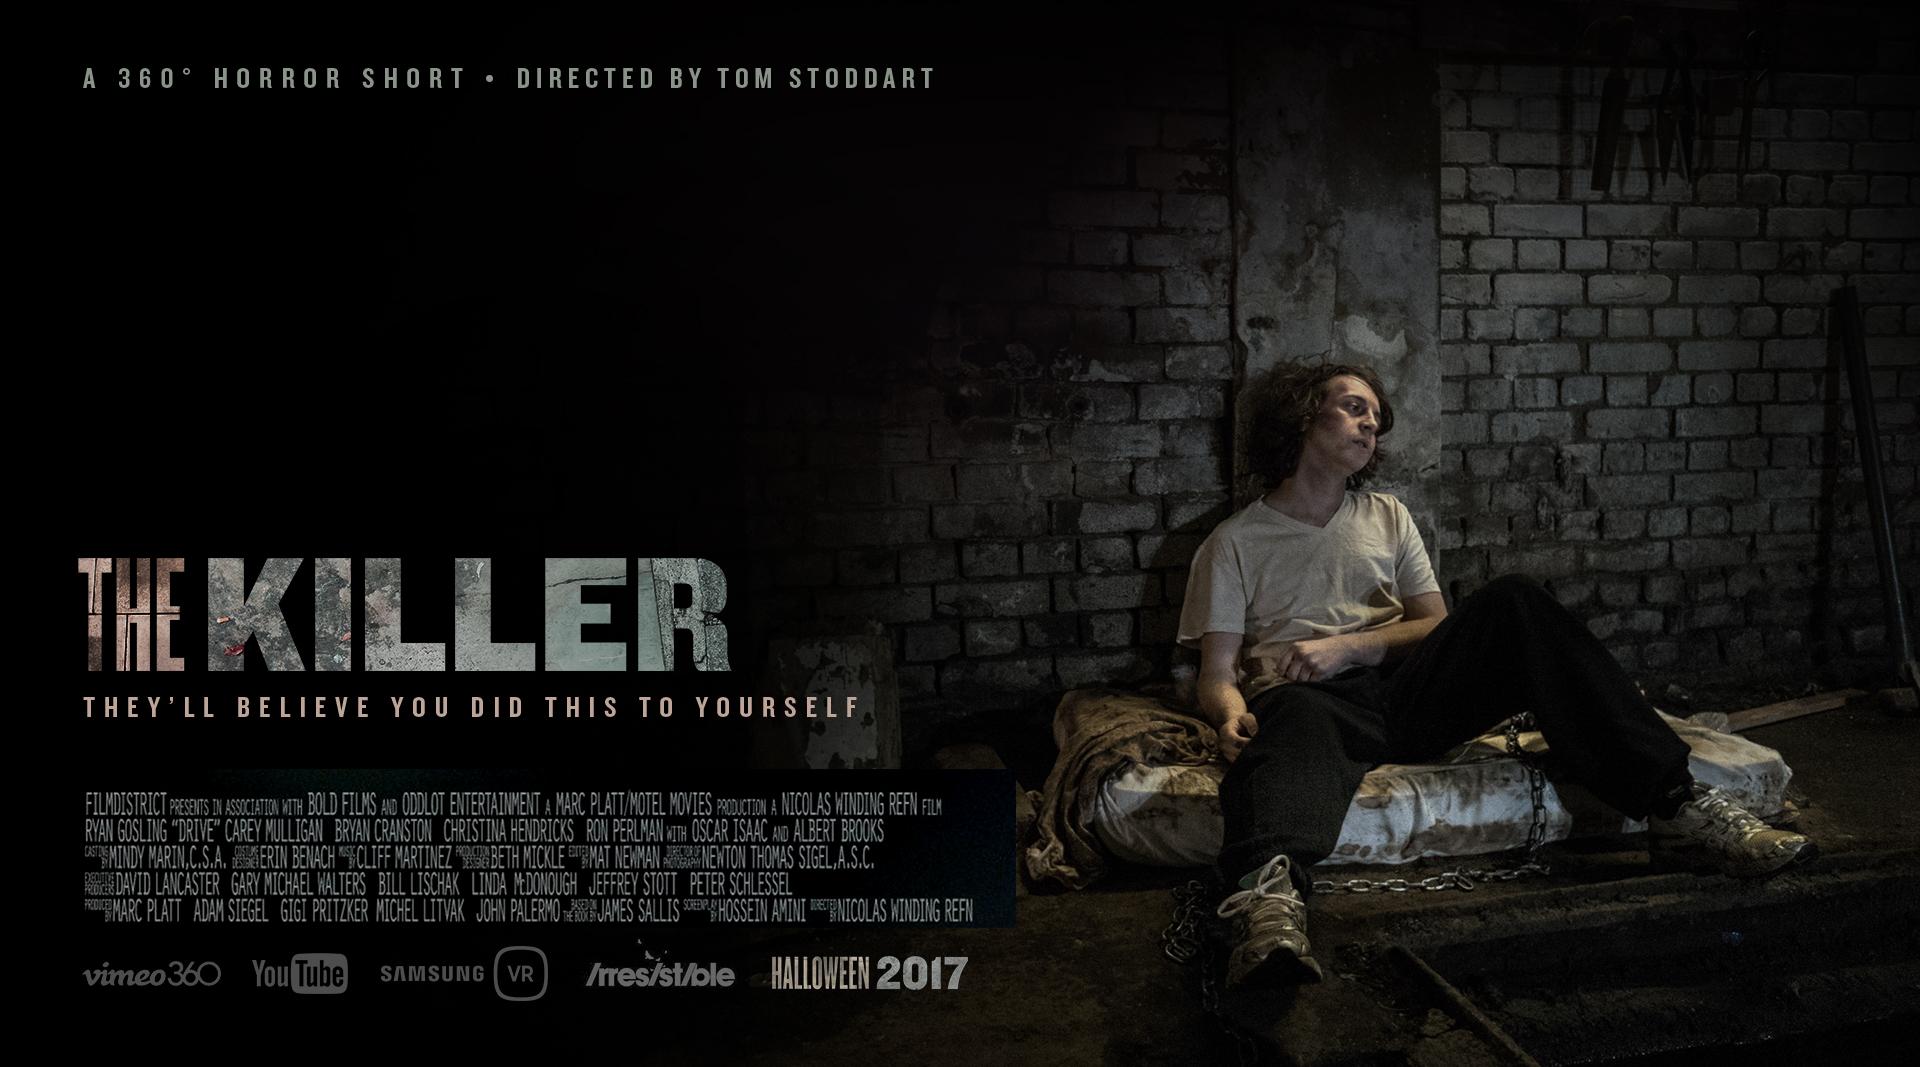 TheKiller_HortizontalPosters_kid.jpg